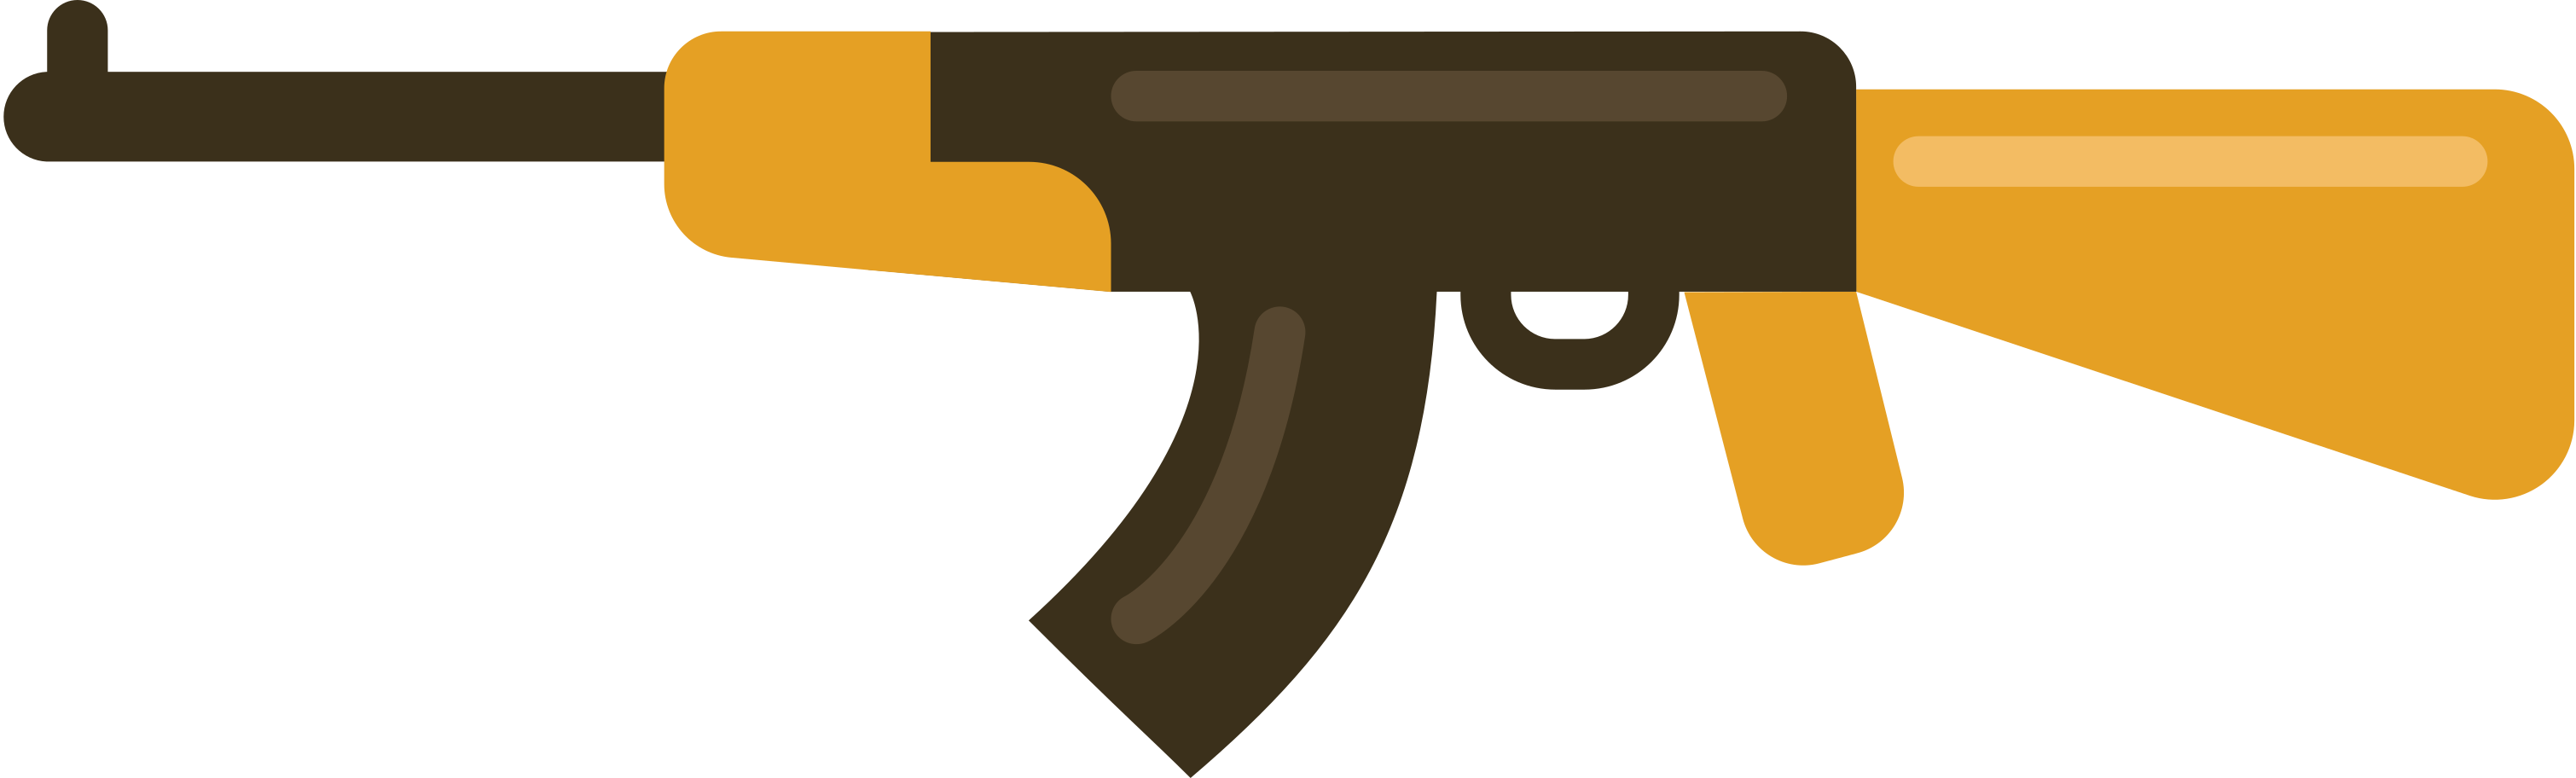 machine gun ak Clipart illustration in PNG, SVG